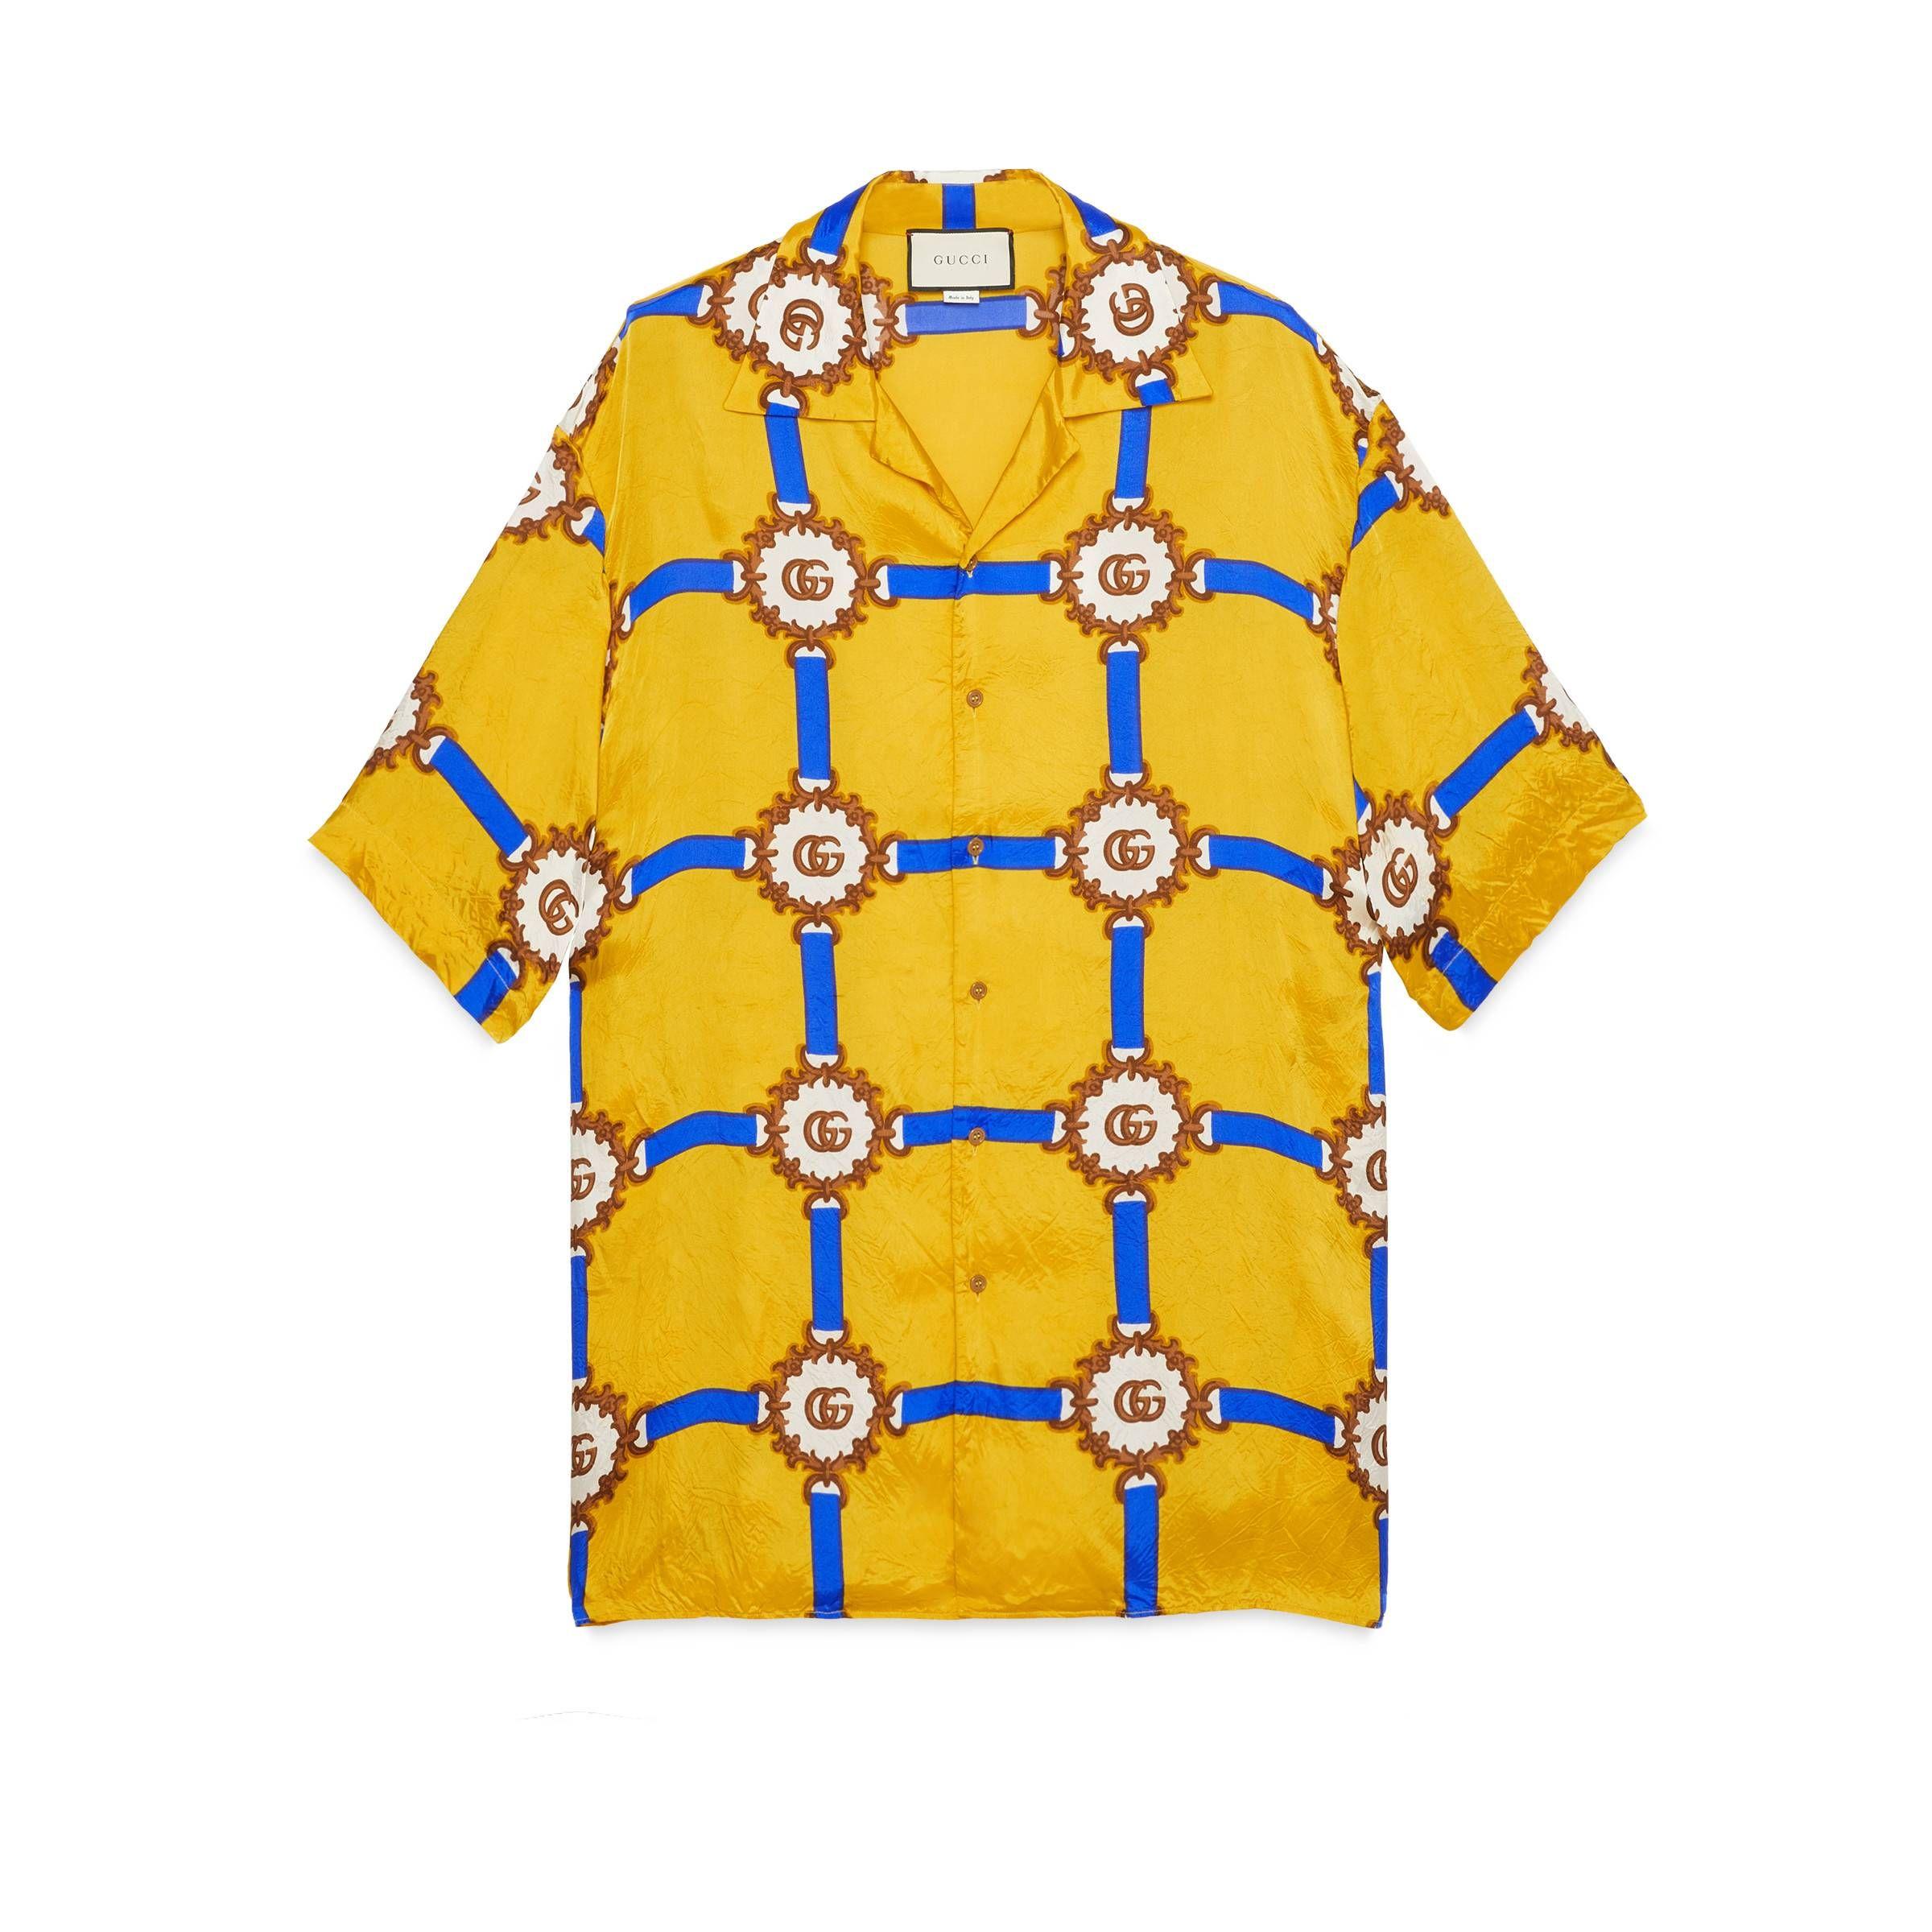 5668ccc3547e GUCCI BOWLING SHIRT WITH GG HARNESS PRINT. #gucci #cloth | Gucci in ...